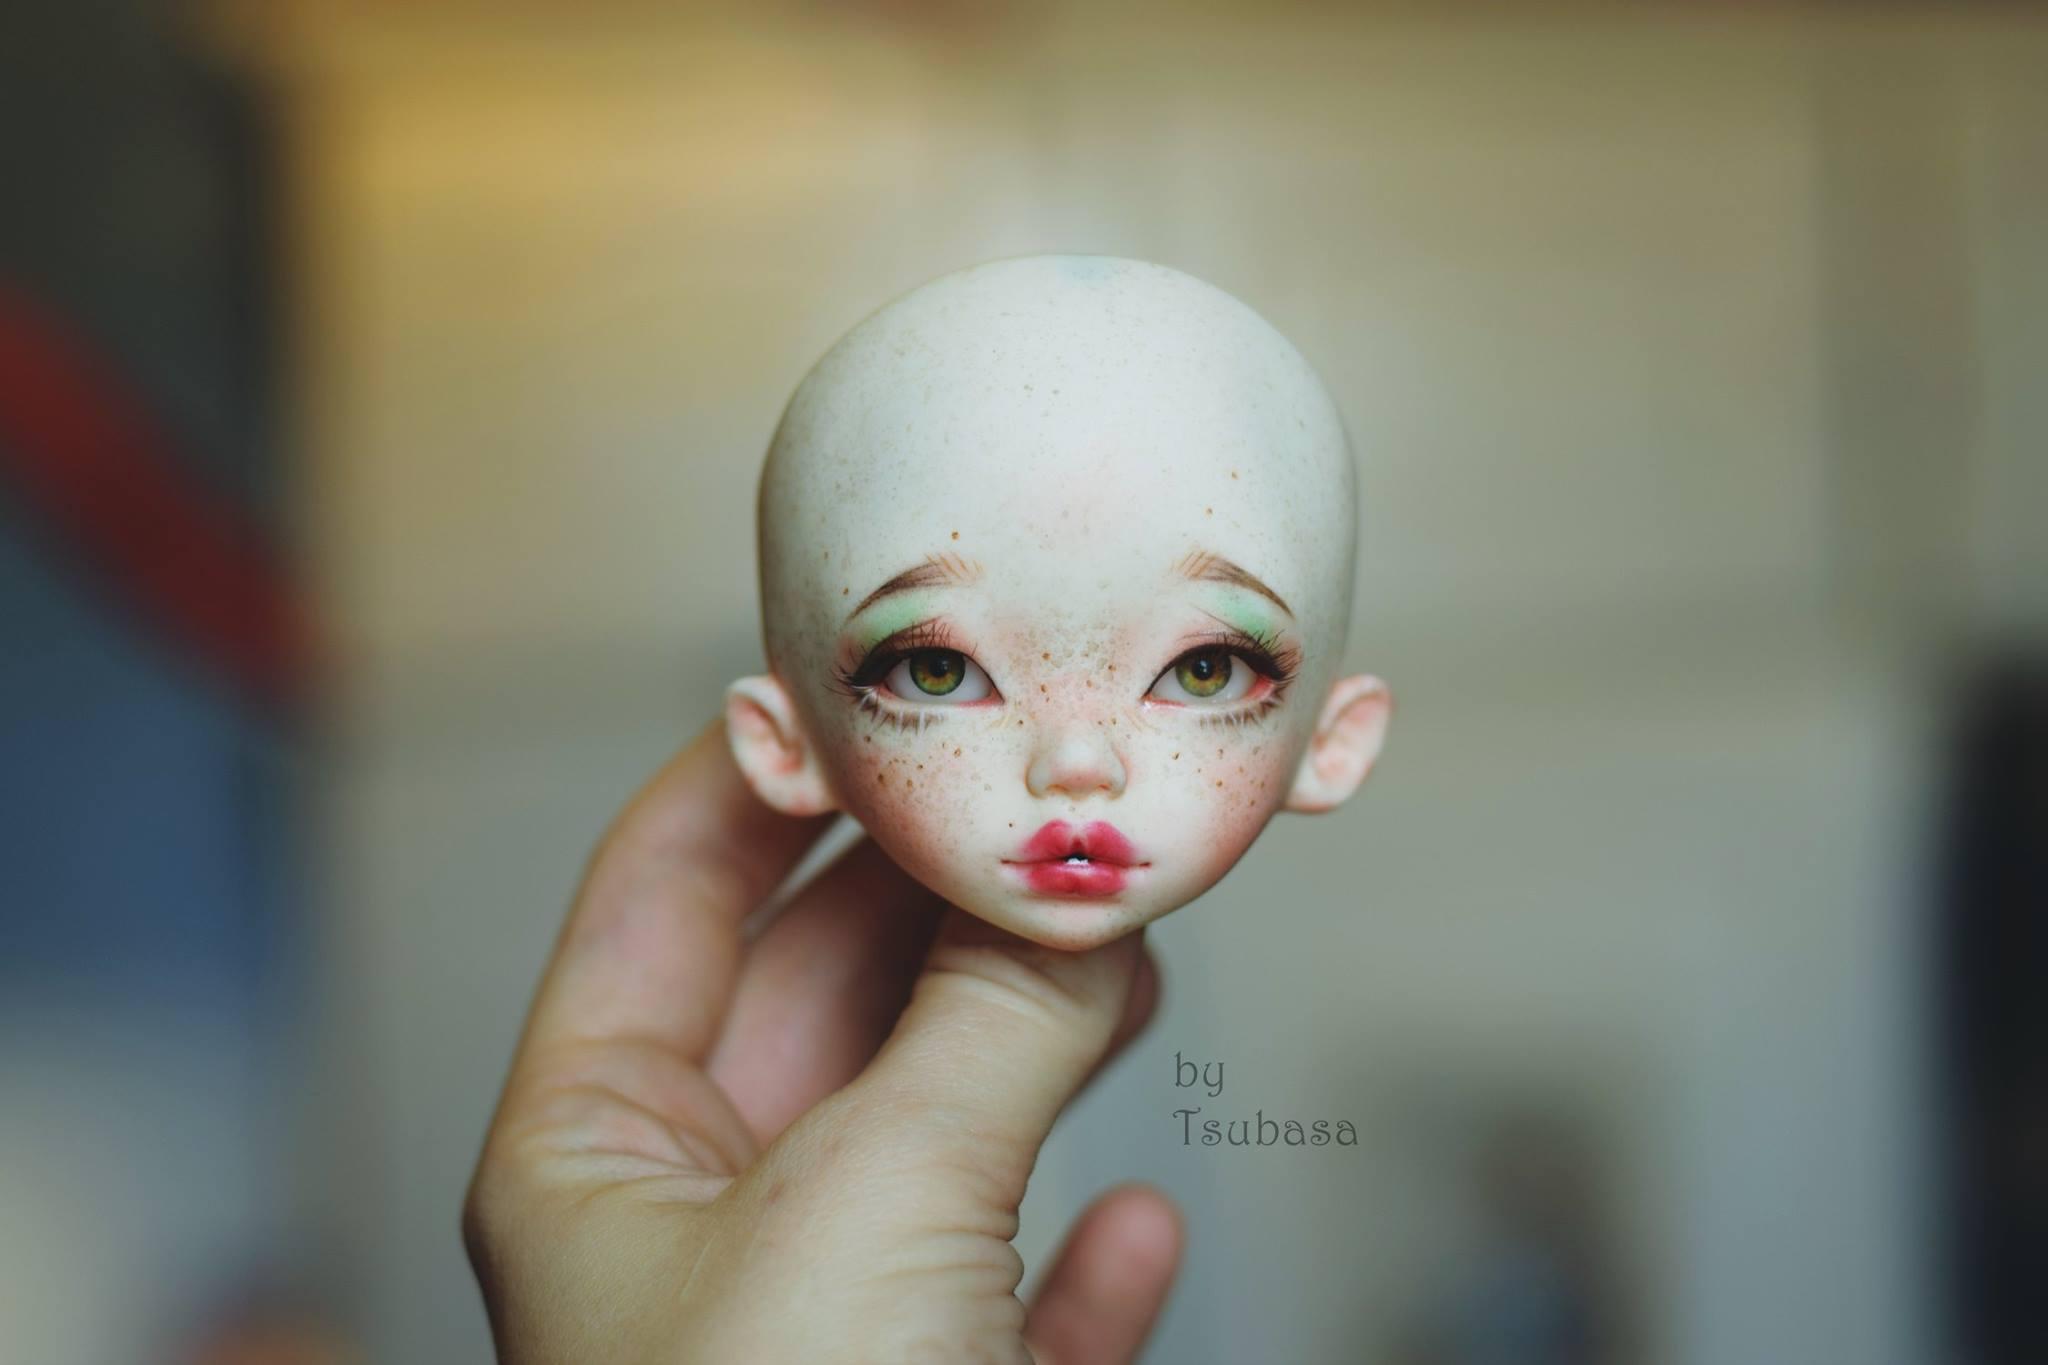 Vends toutes mes dolls: K6, iplehouse, DIM....  26961710